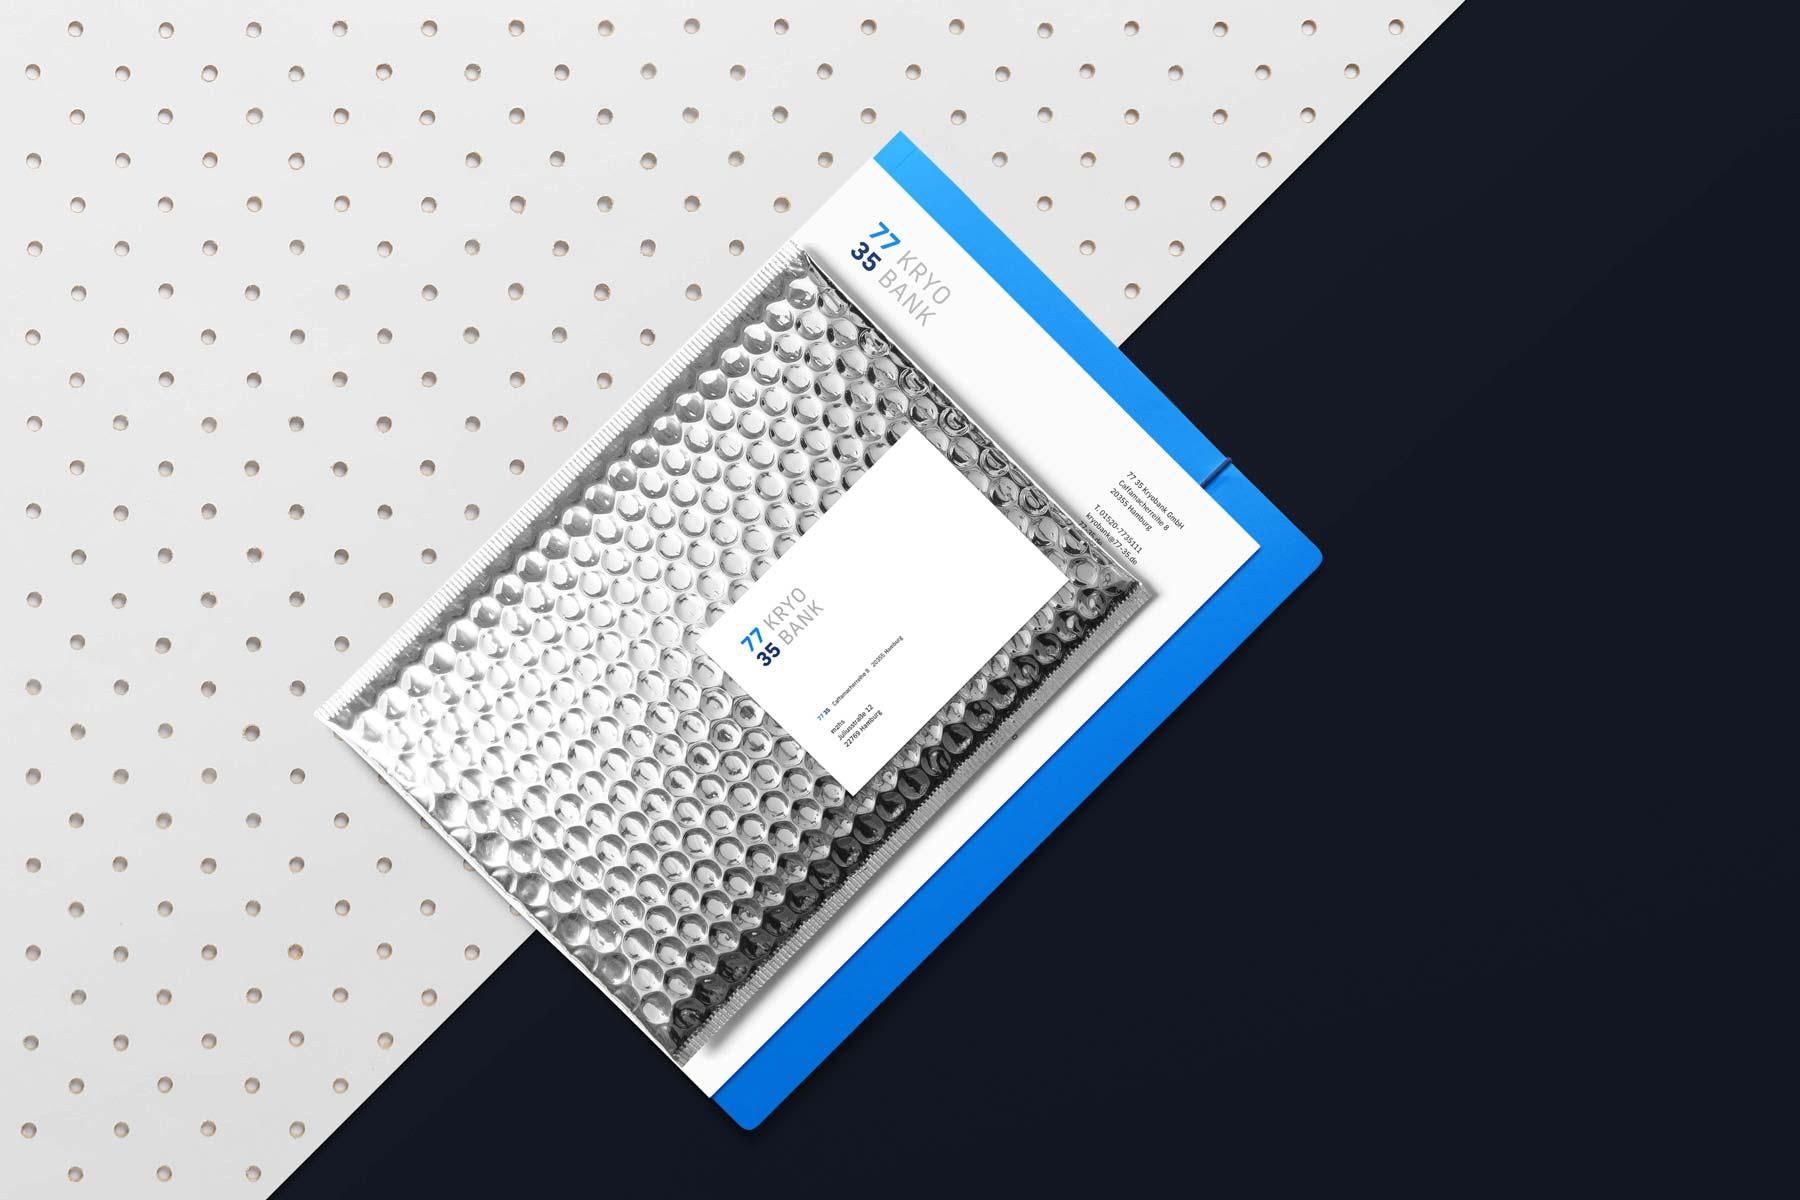 m2hs-7735-Kryobank-Stationary